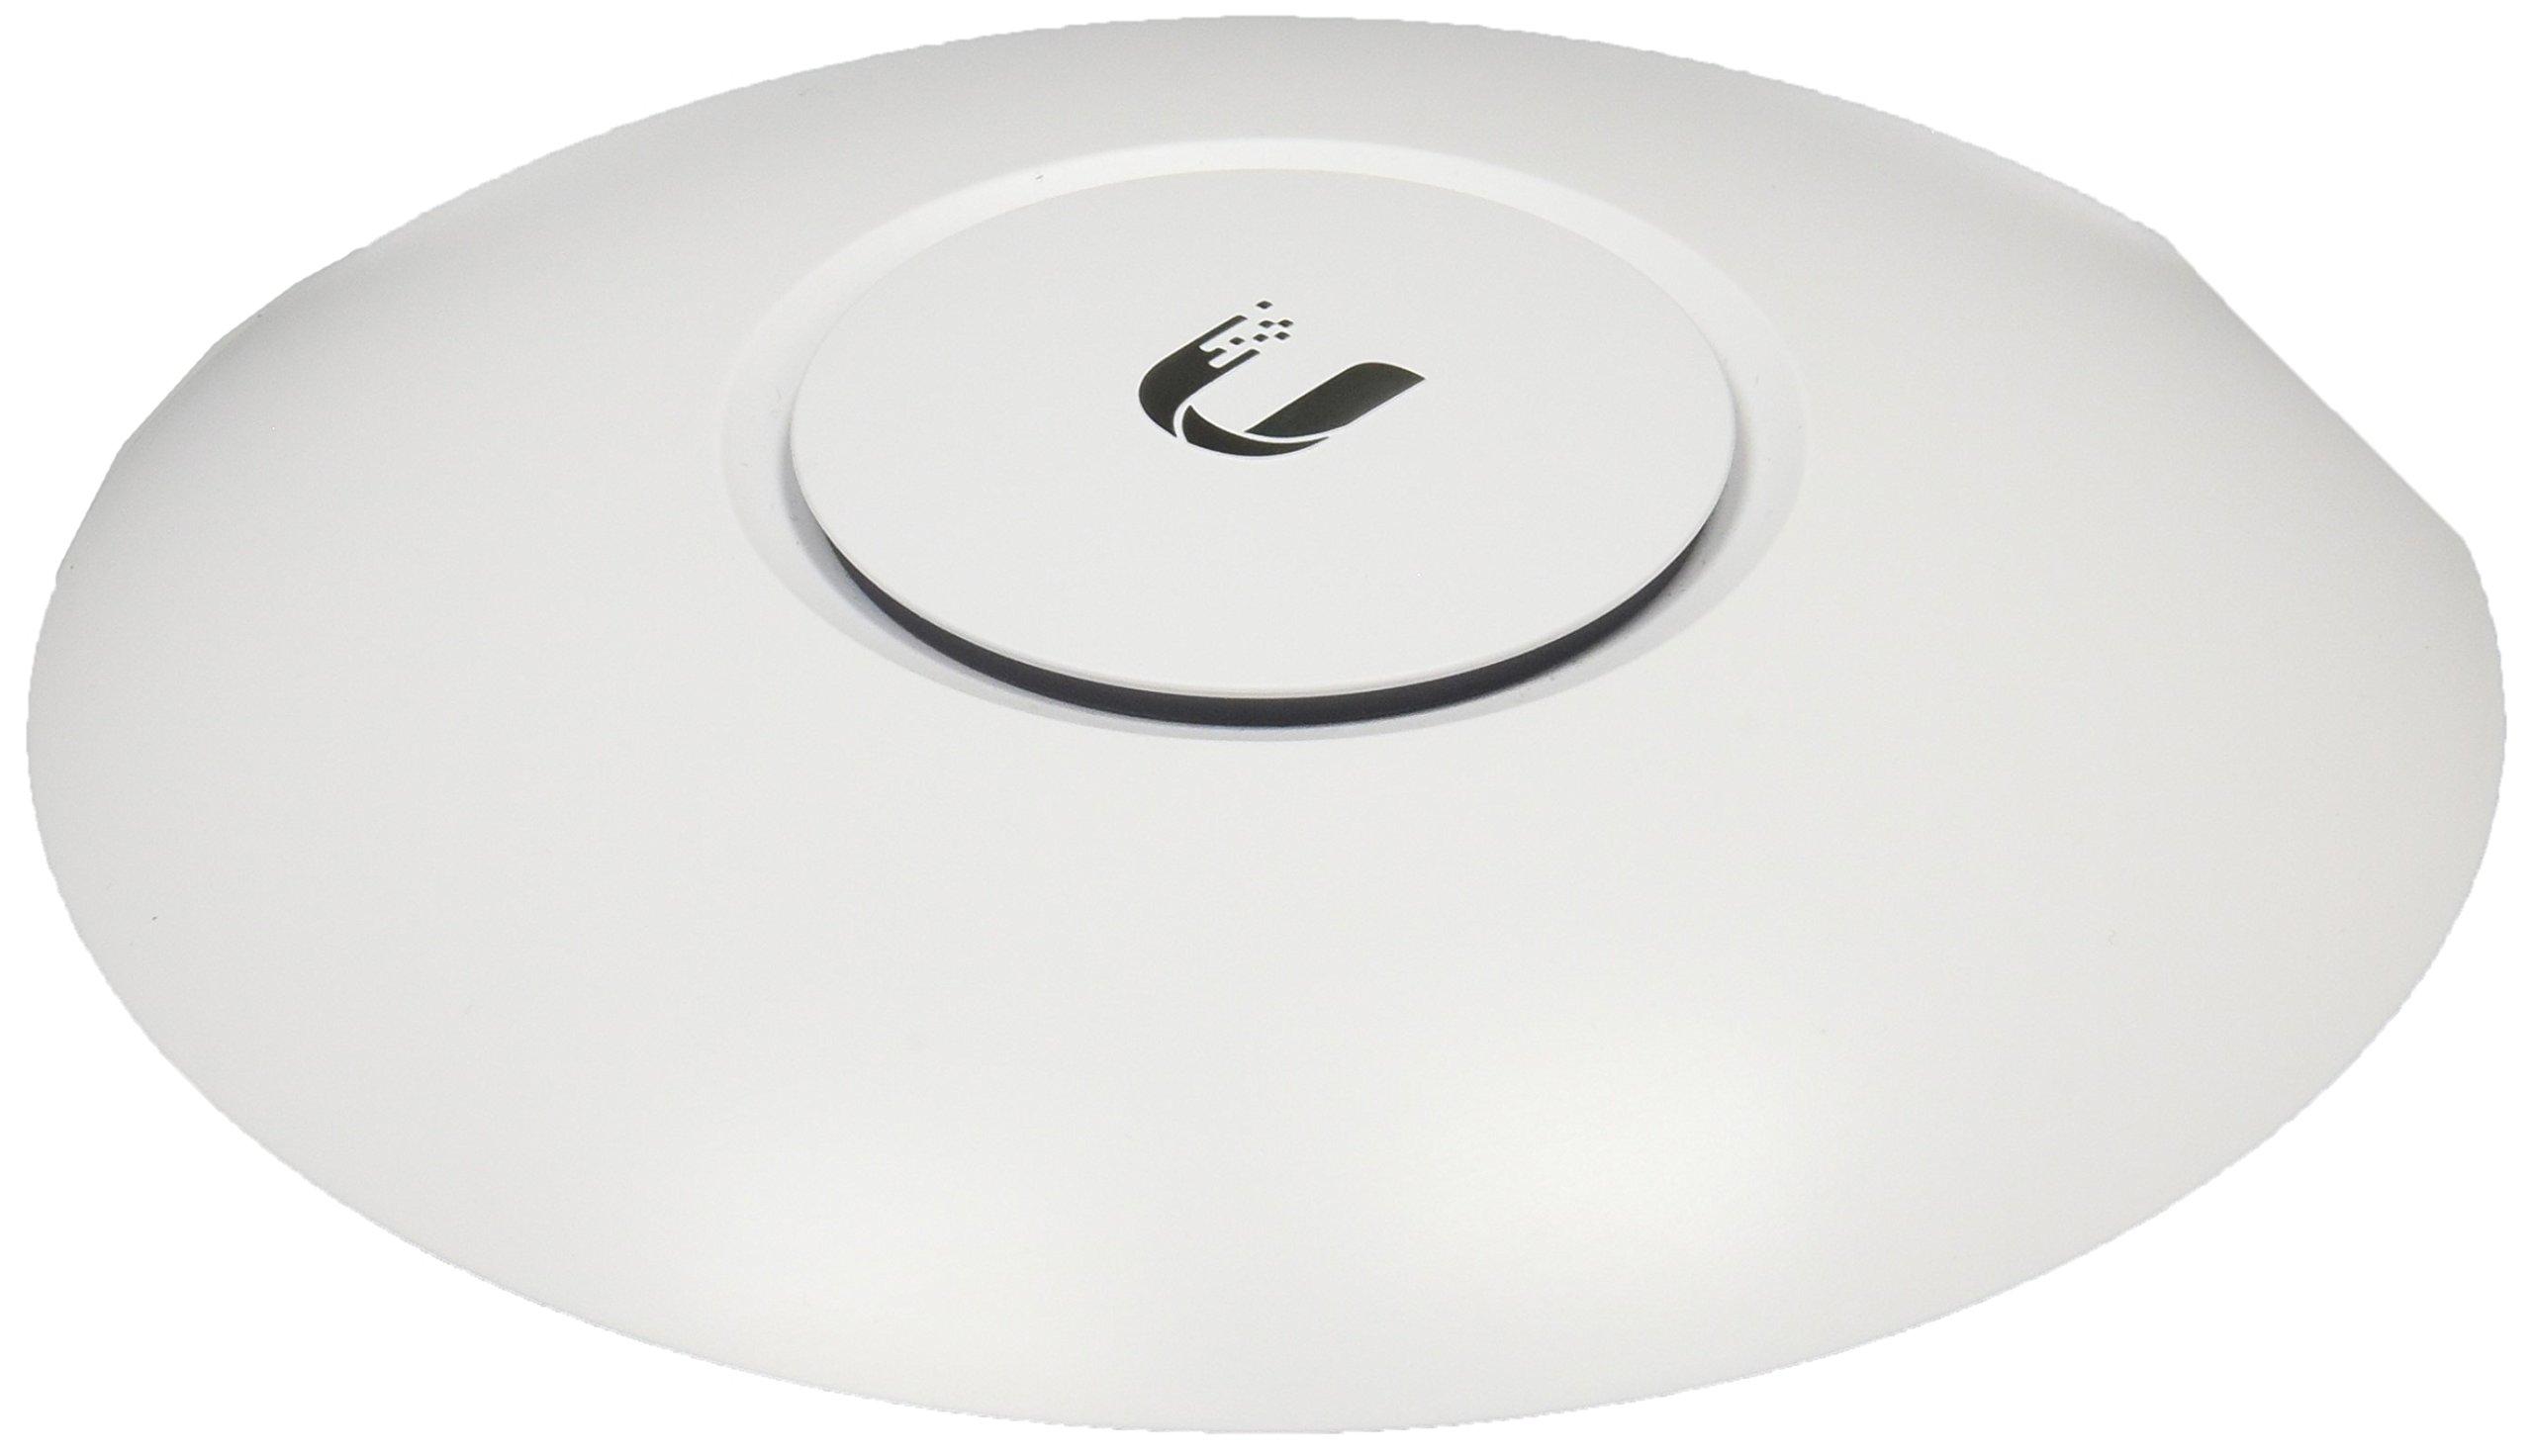 Ubiquiti Unifi Ap-AC Lite - Wireless Access Point - 802.11 B/A/G/n/AC (UAPACLITE5US)